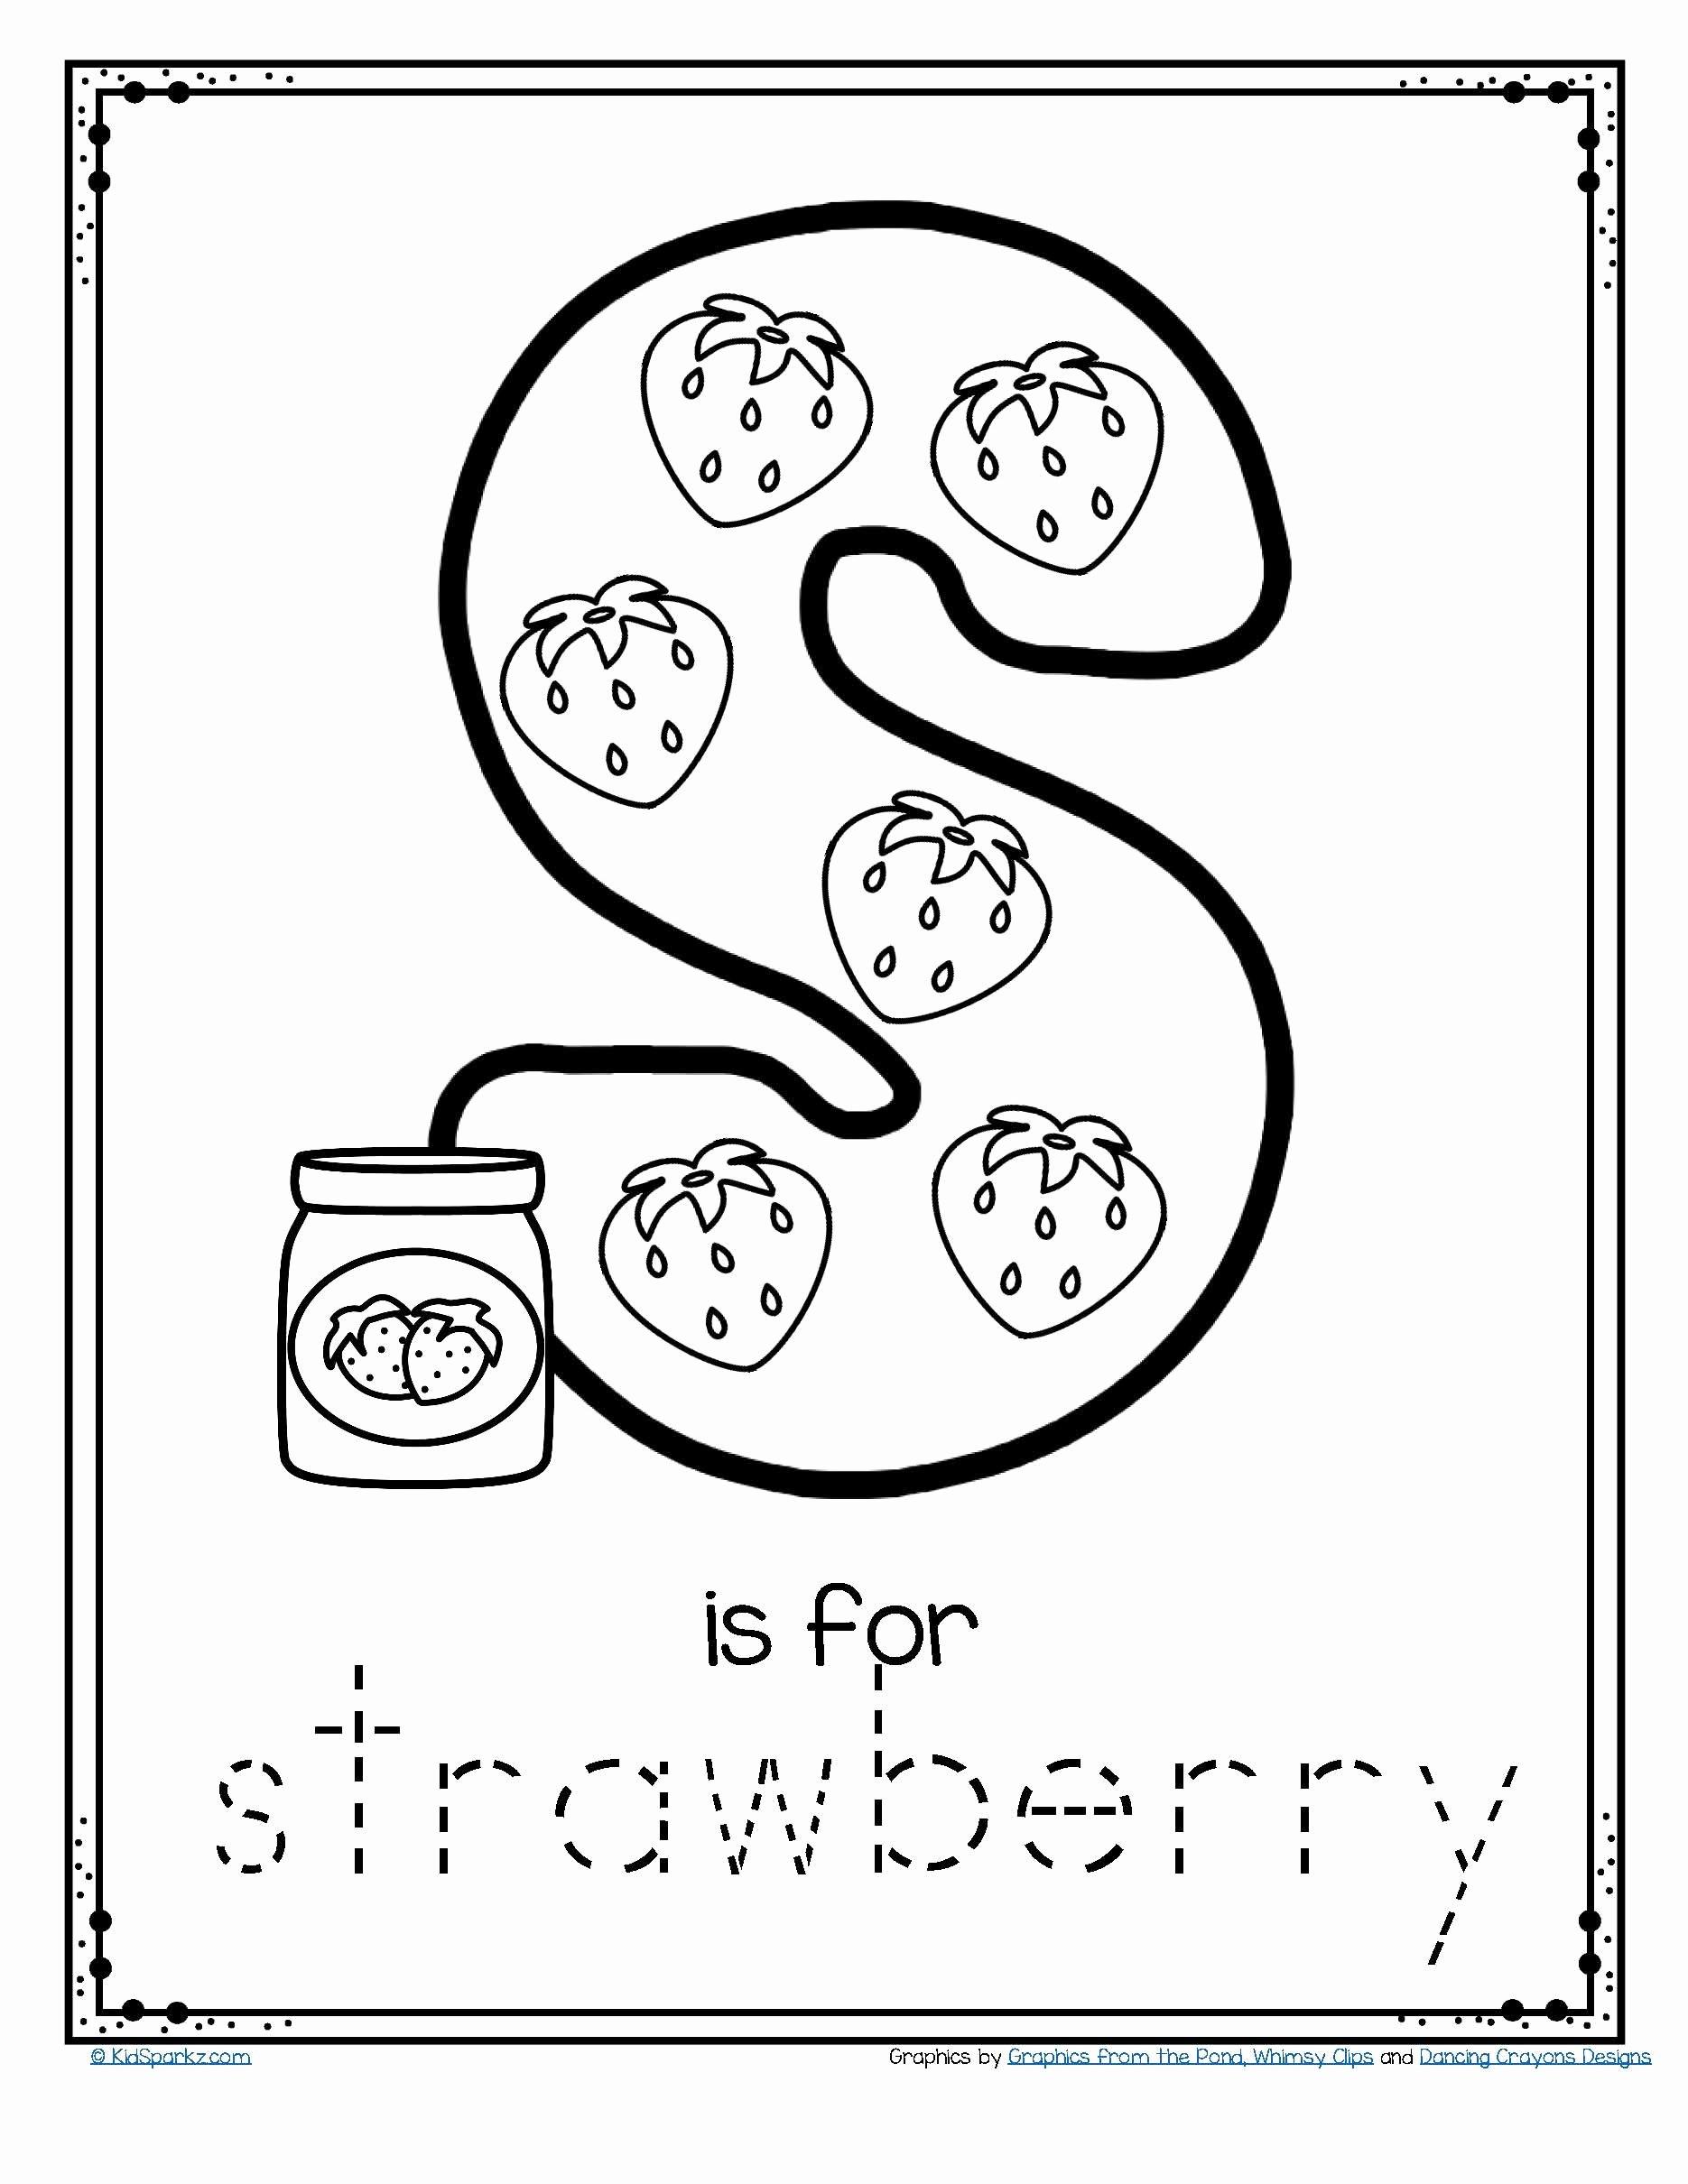 Printable Worksheets For Preschoolers Math